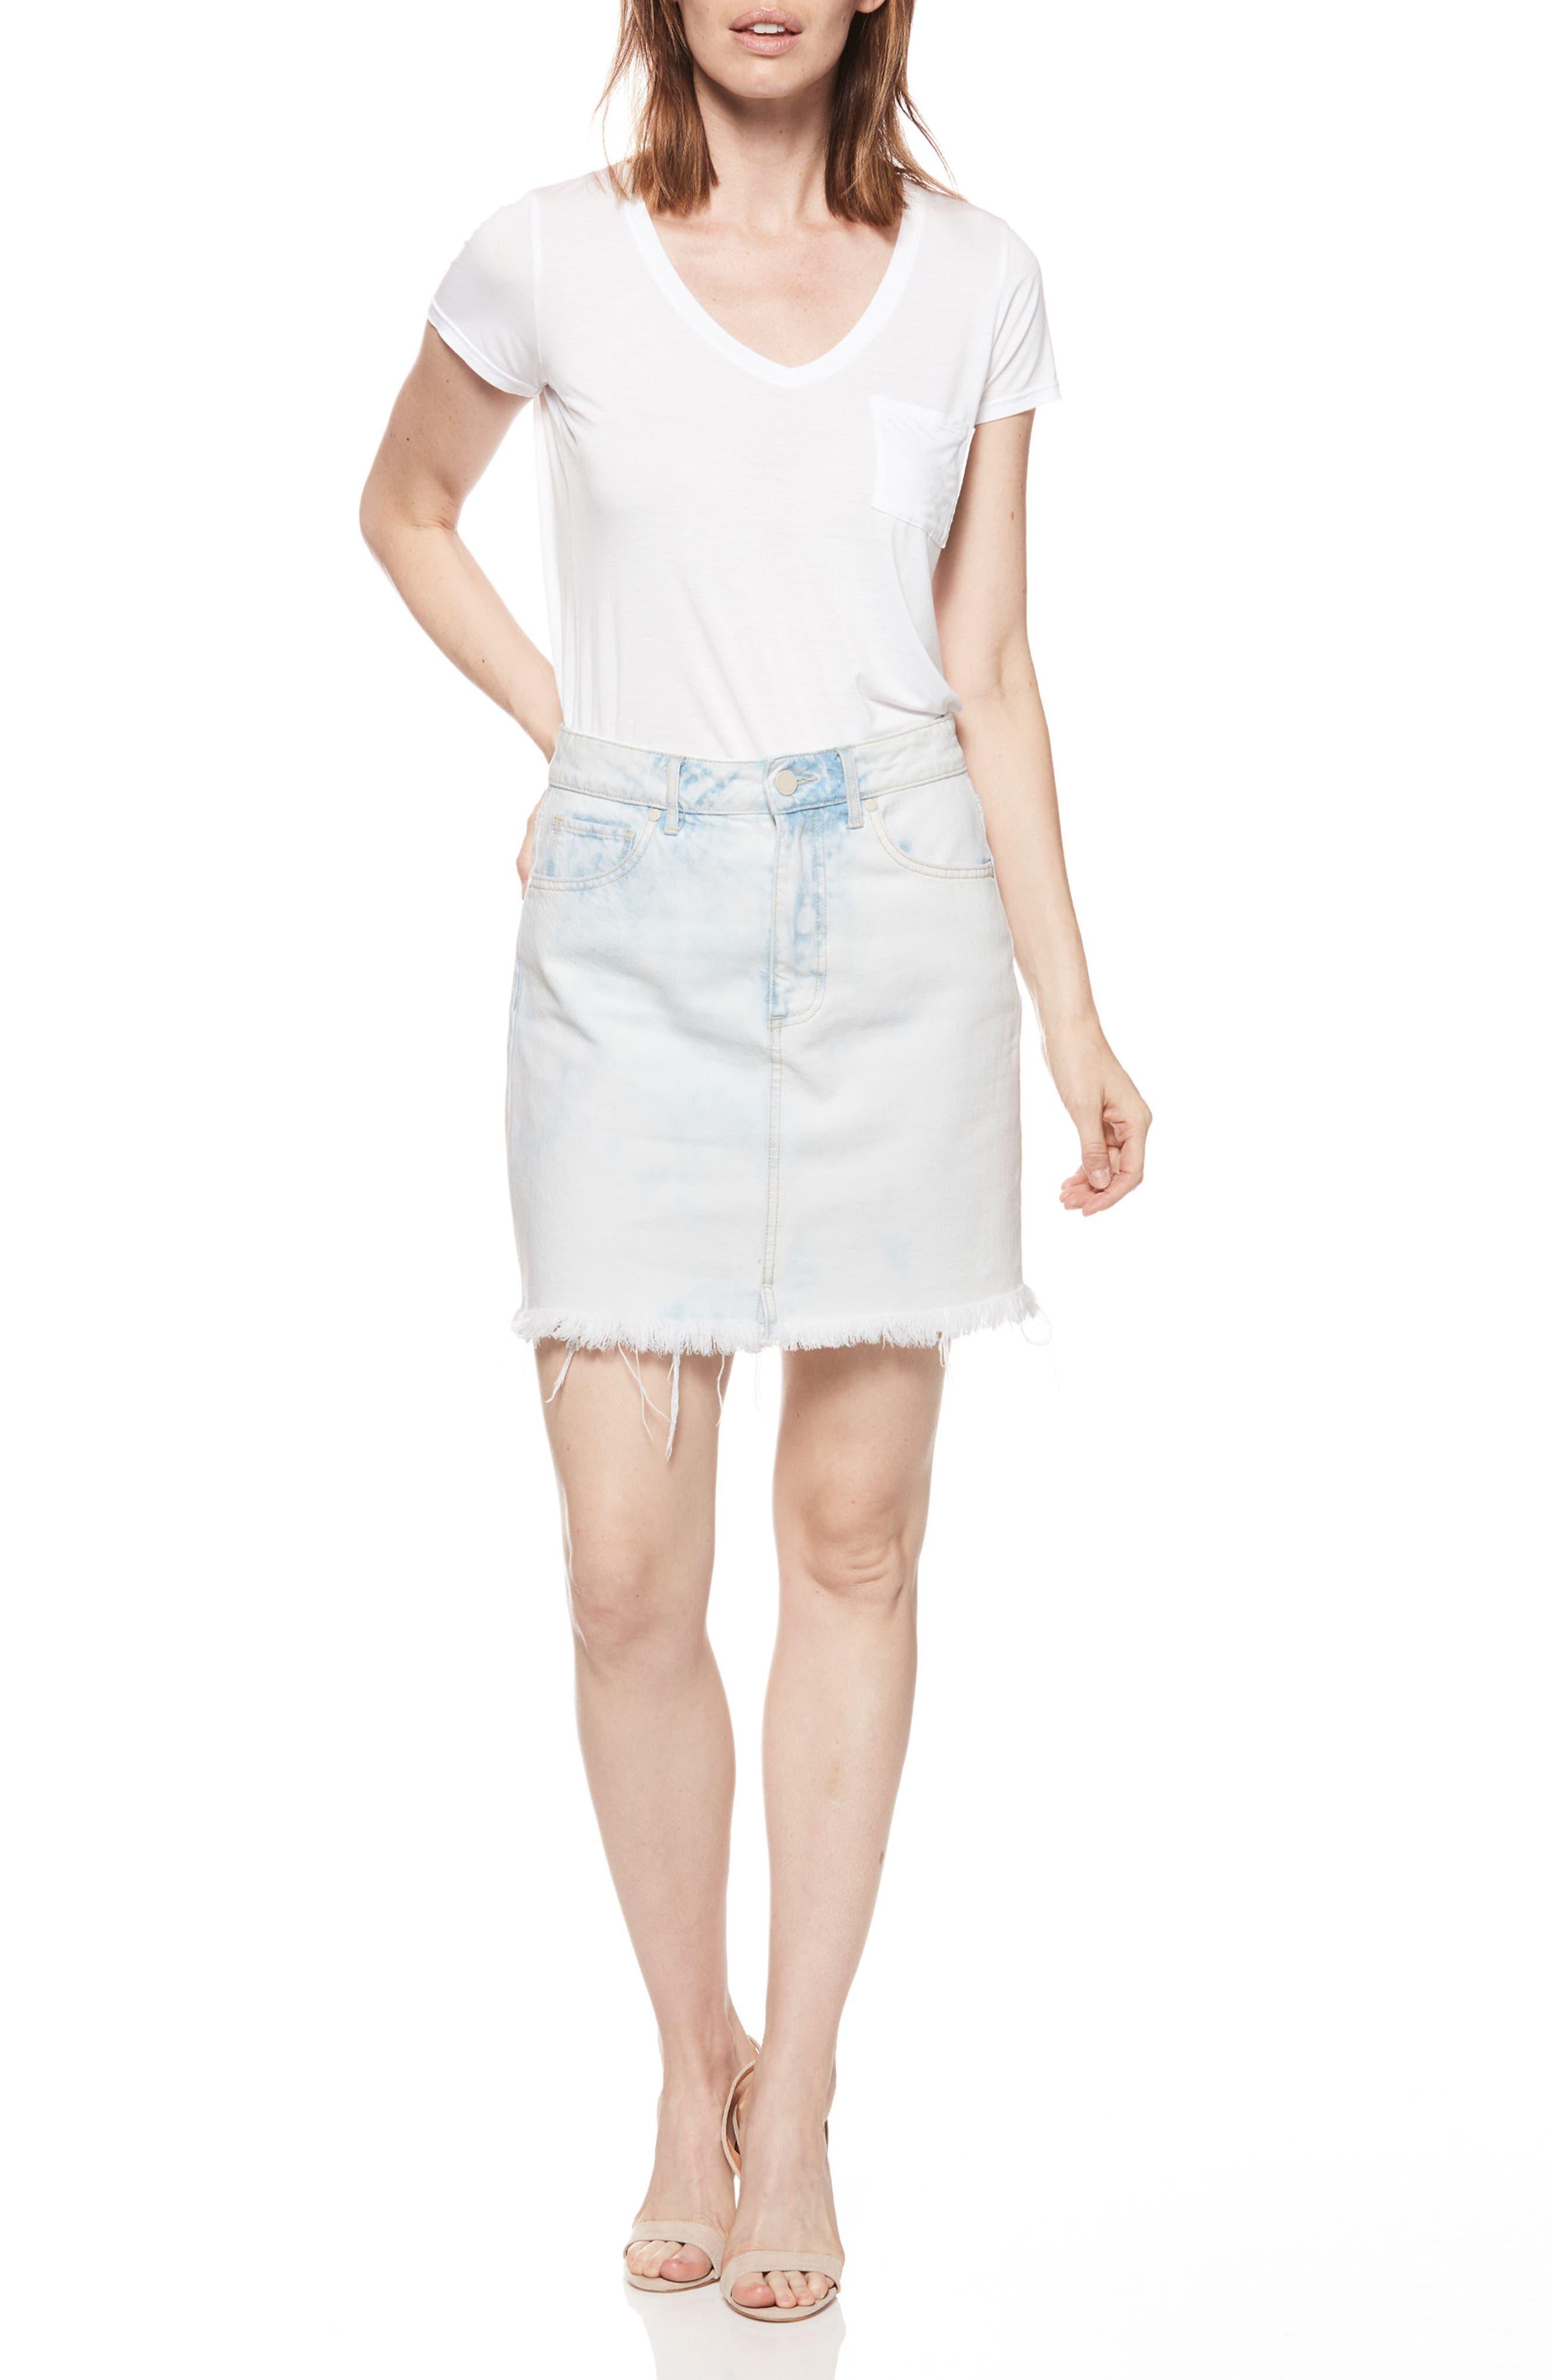 PAIGE,                             Jamine High Waist Denim Skirt,                             Alternate thumbnail 3, color,                             400